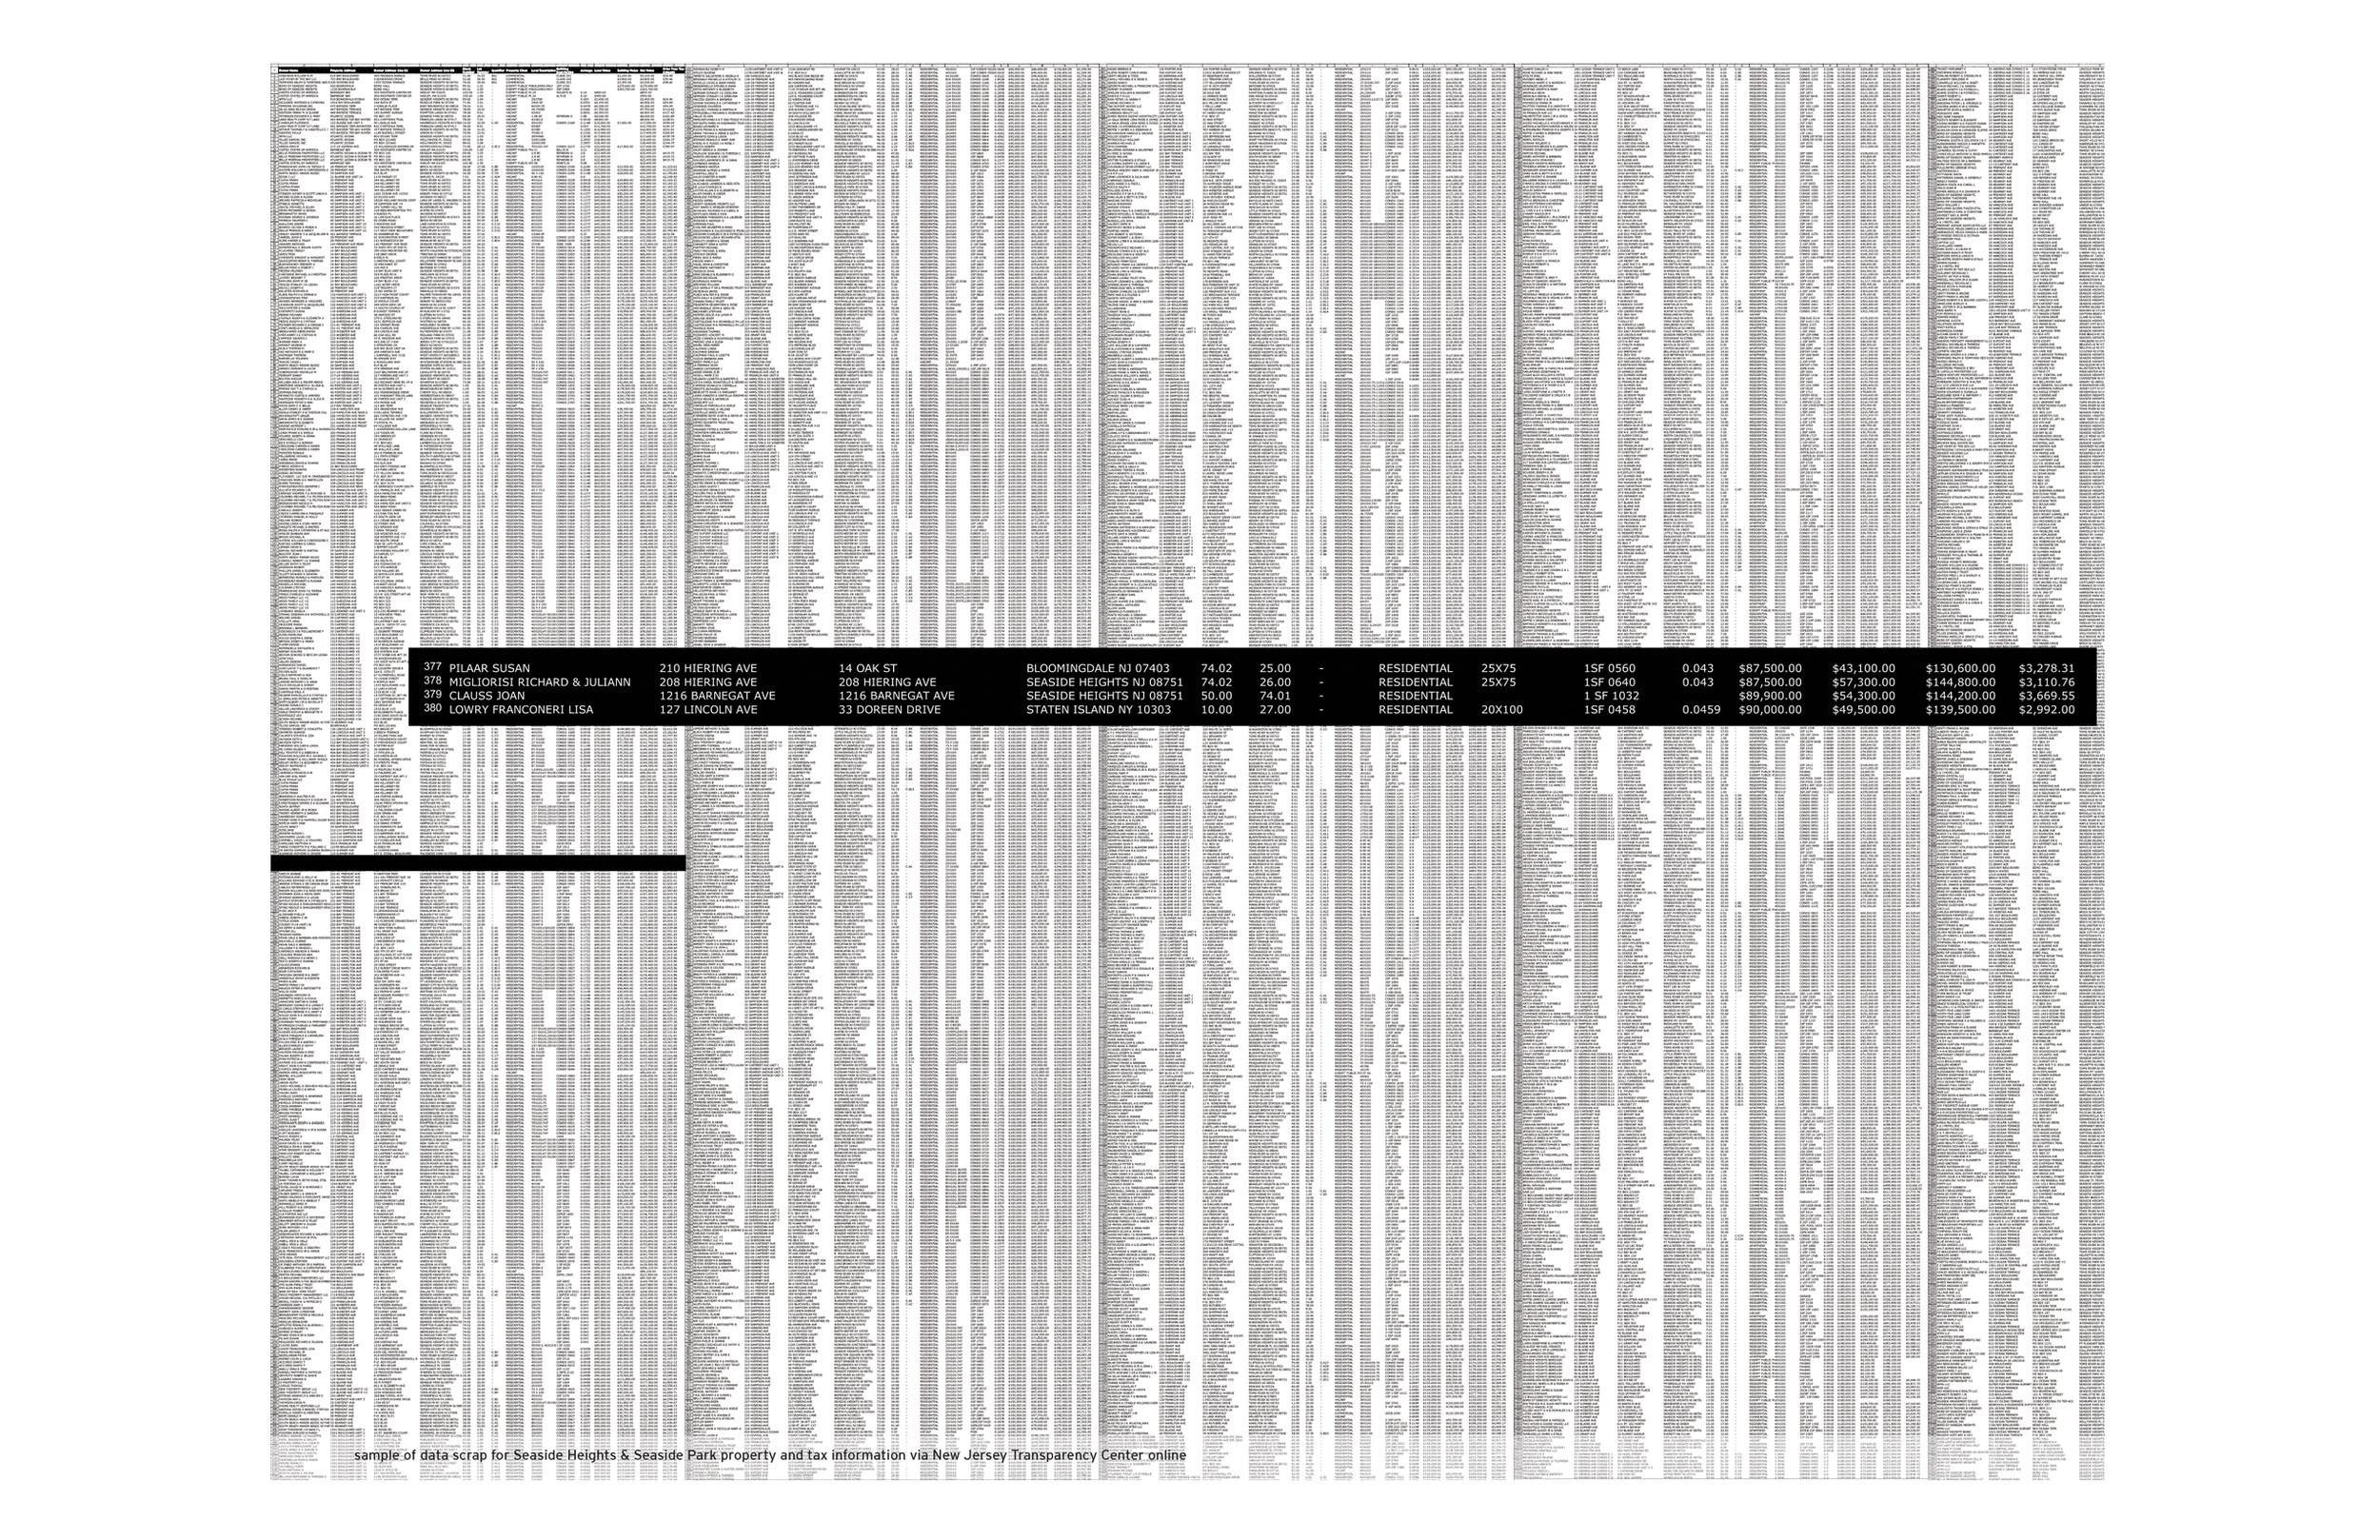 ReappropriatingValue_08.jpg